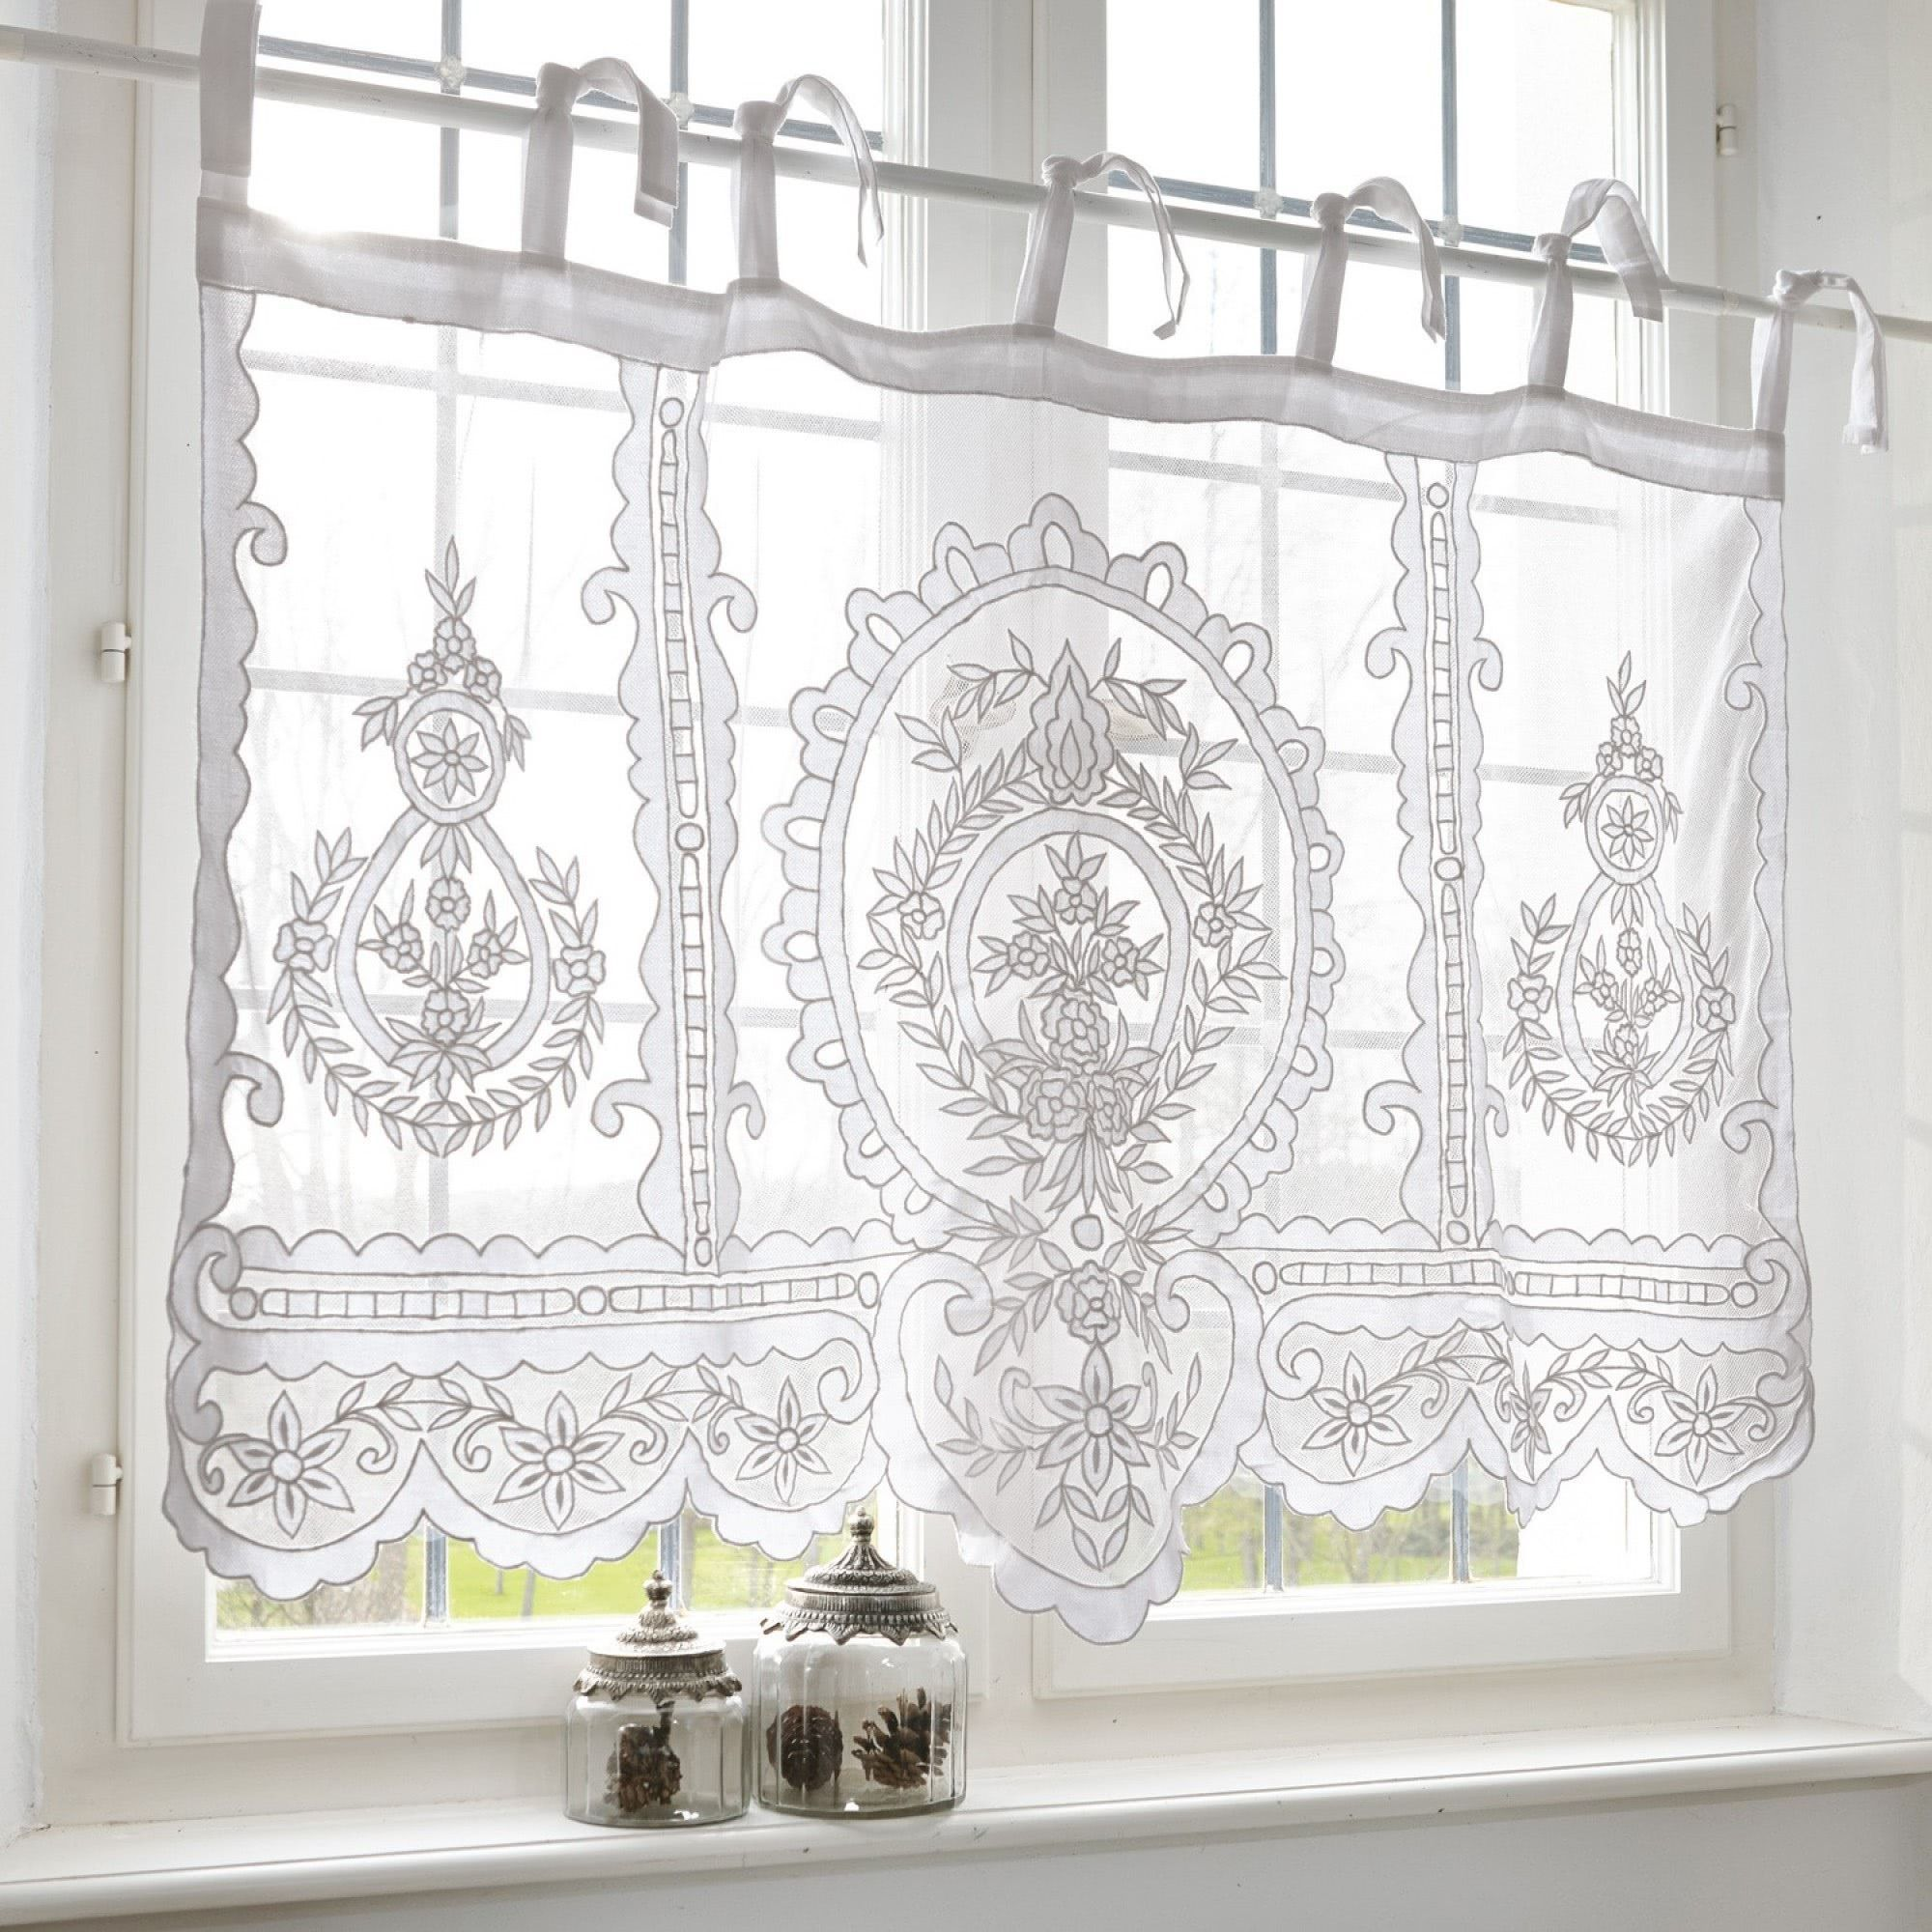 Scheibengardine Elenoire Loberon Coming Home Whitecurtains Cottage Curtains Diy Curtains Voile Curtains